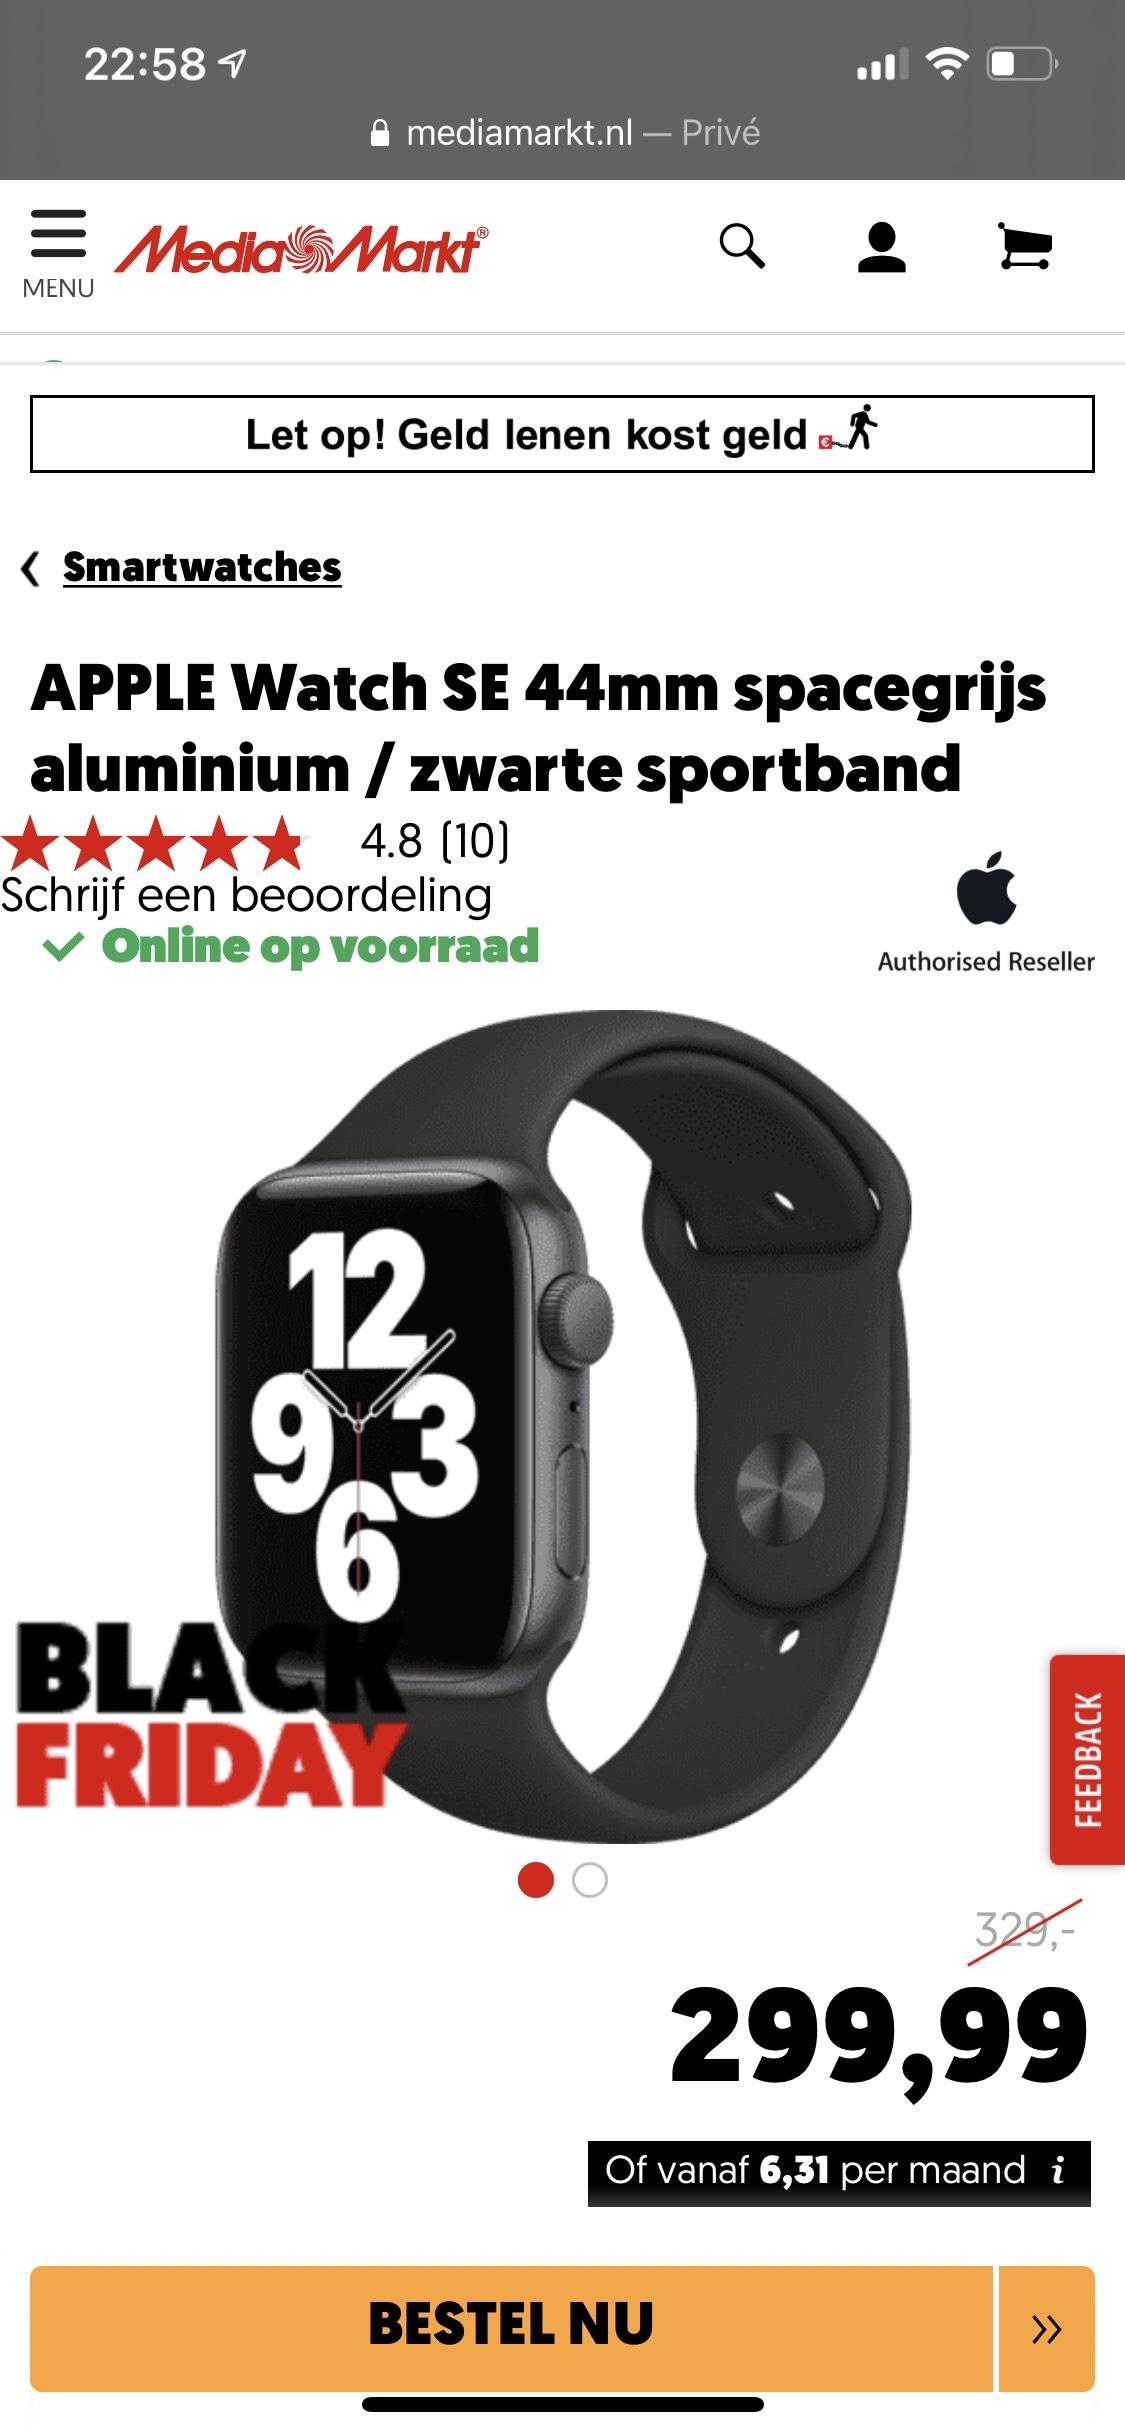 APPLE Watch SE 44mm spacegrijs aluminium / zwarte sportband